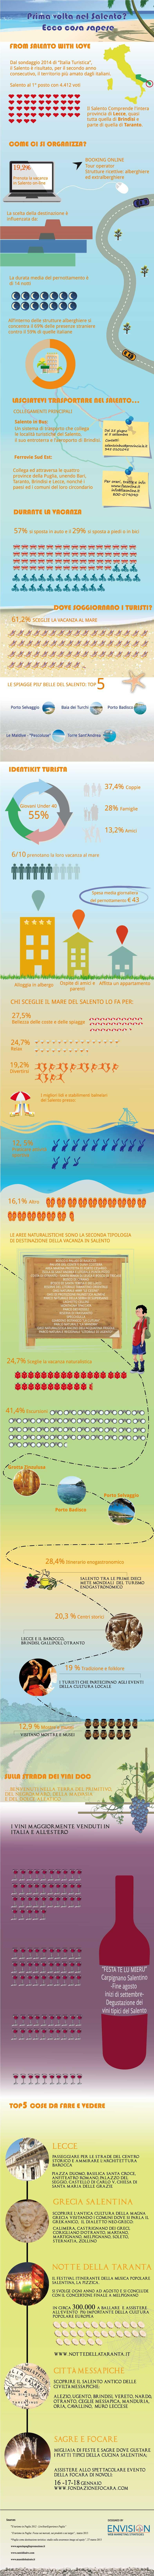 Infografica sul Salento